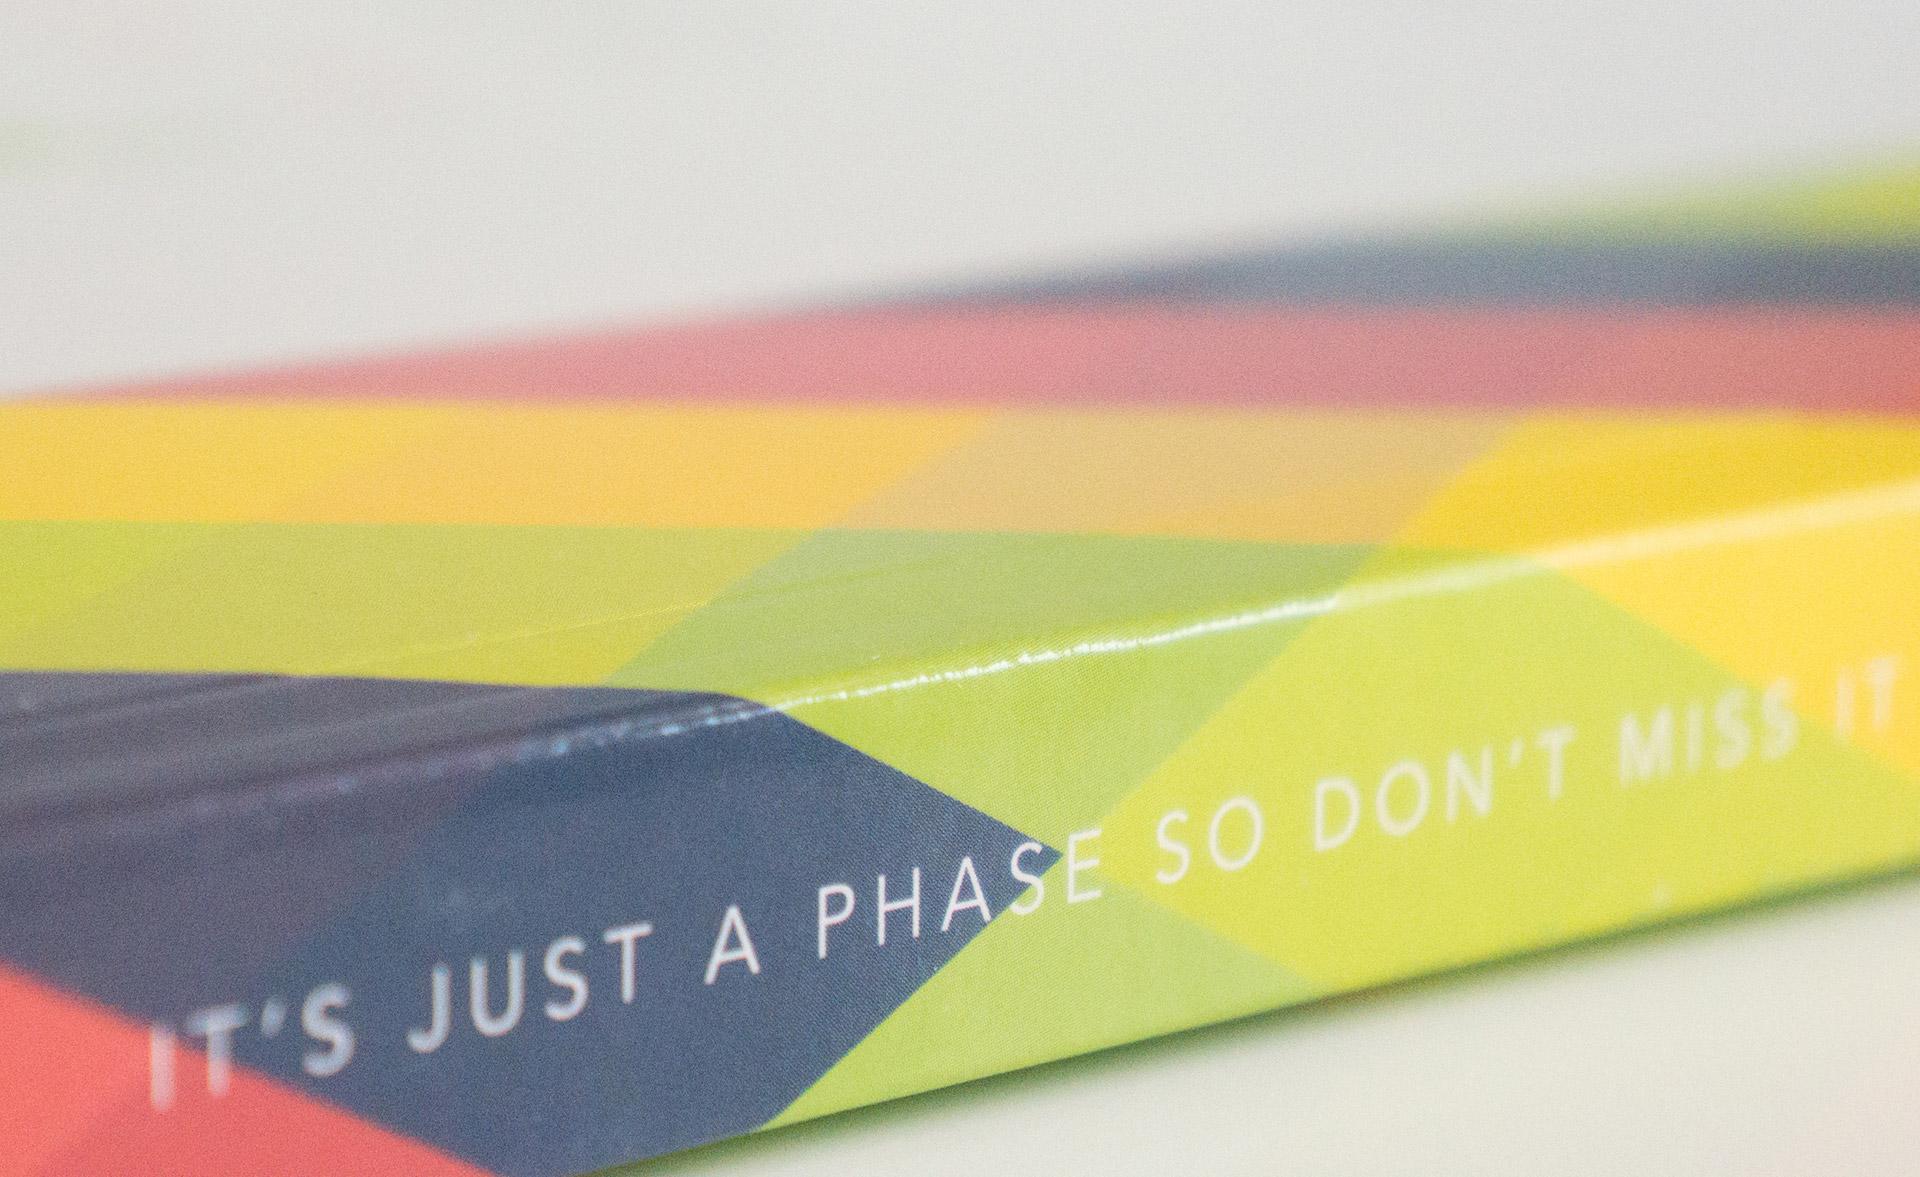 orangeconference-2015-phasebook-04.jpg